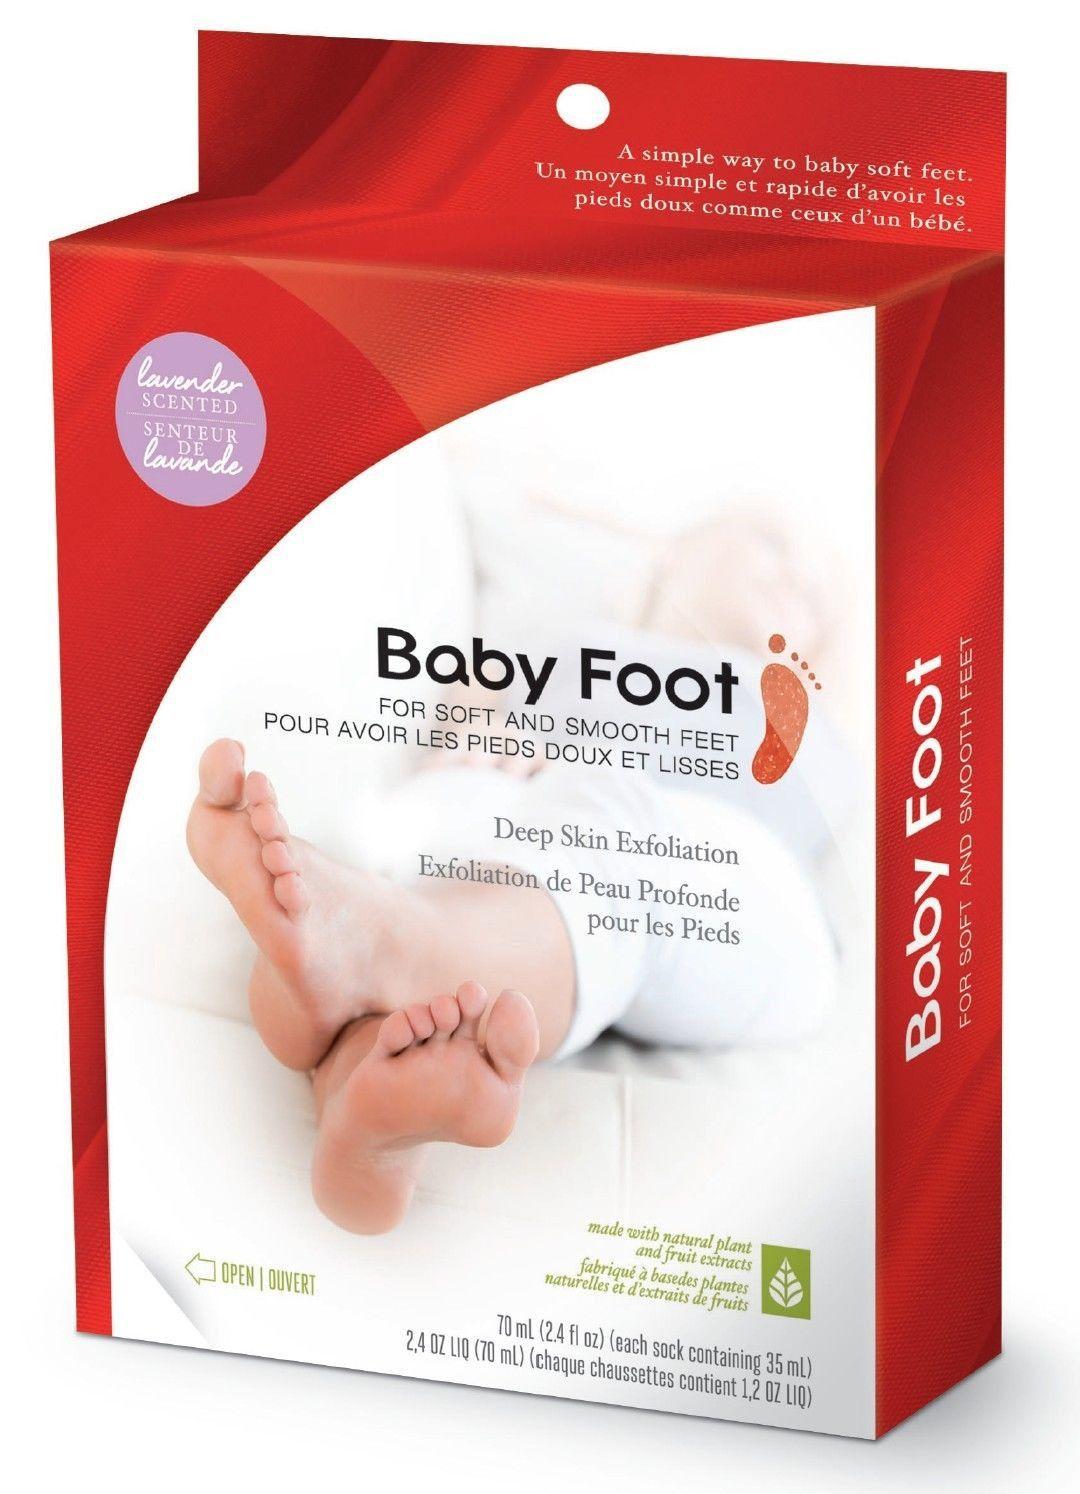 Baby Foot De Salon baby foot deep skin exfoliation for soft & smooth feet